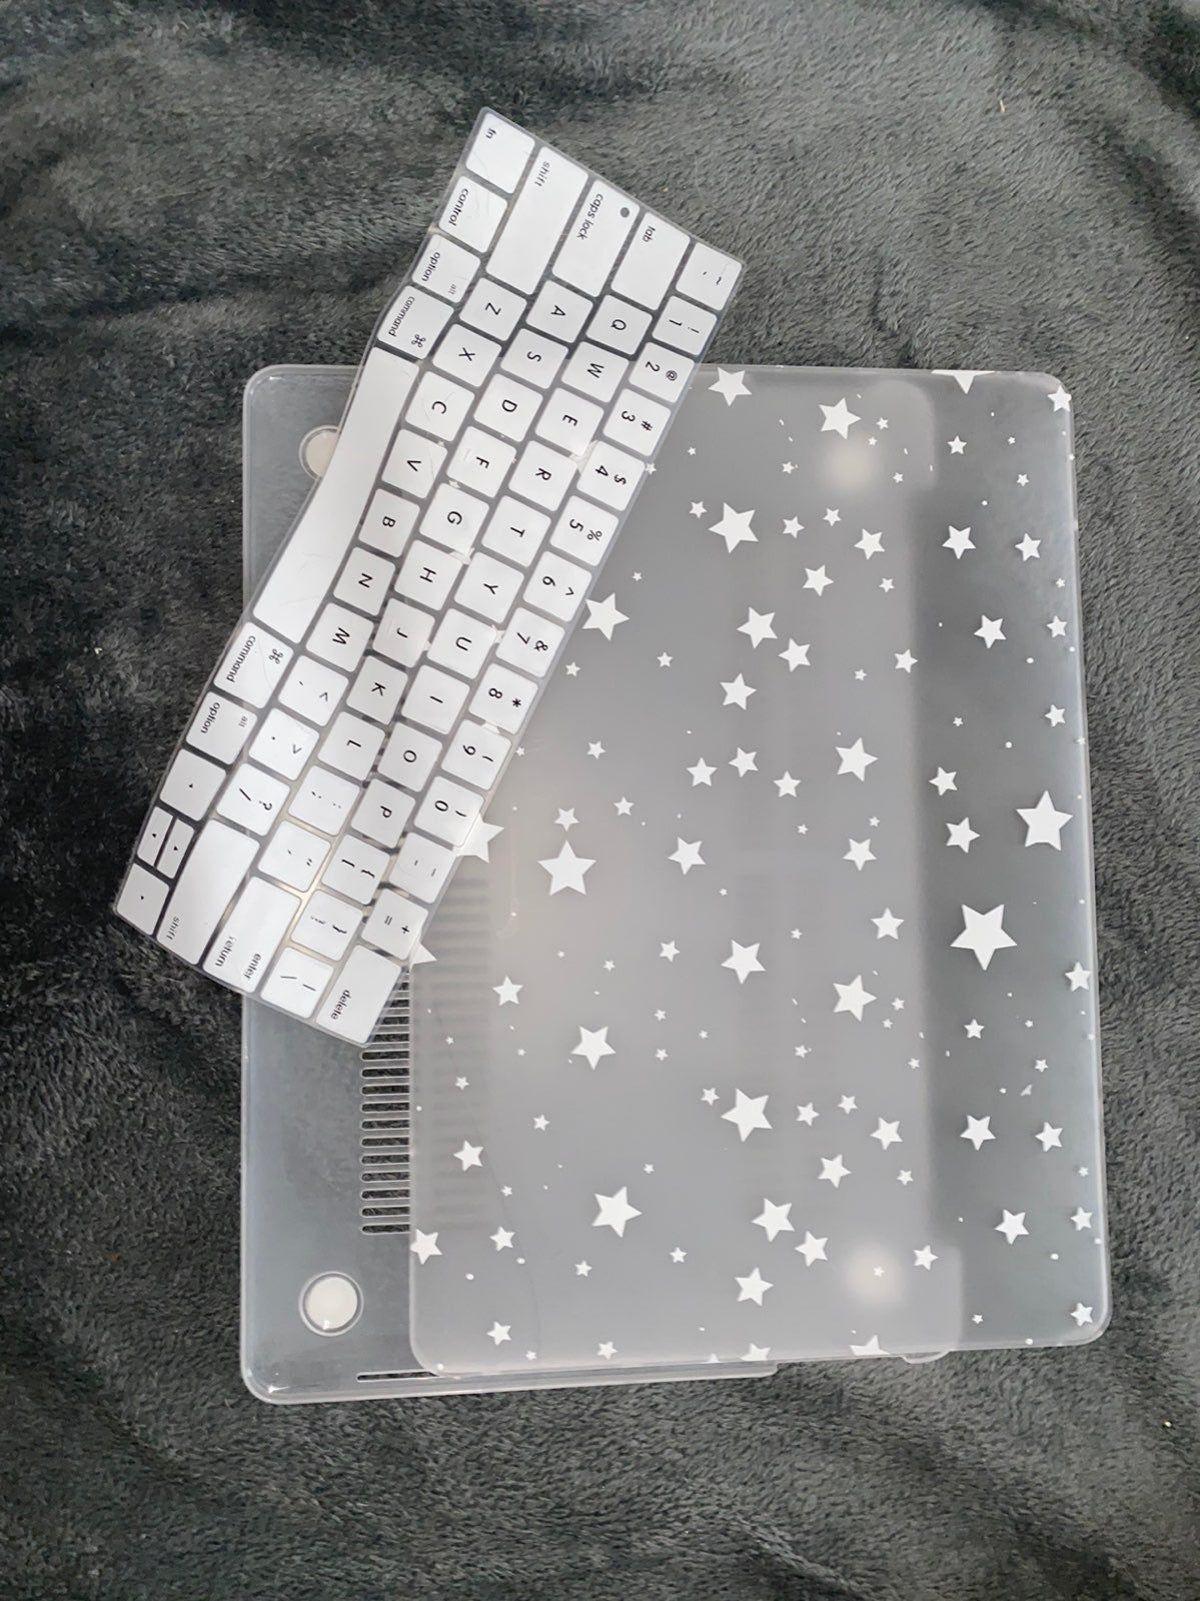 macbook pro 13 inch case on Mercari